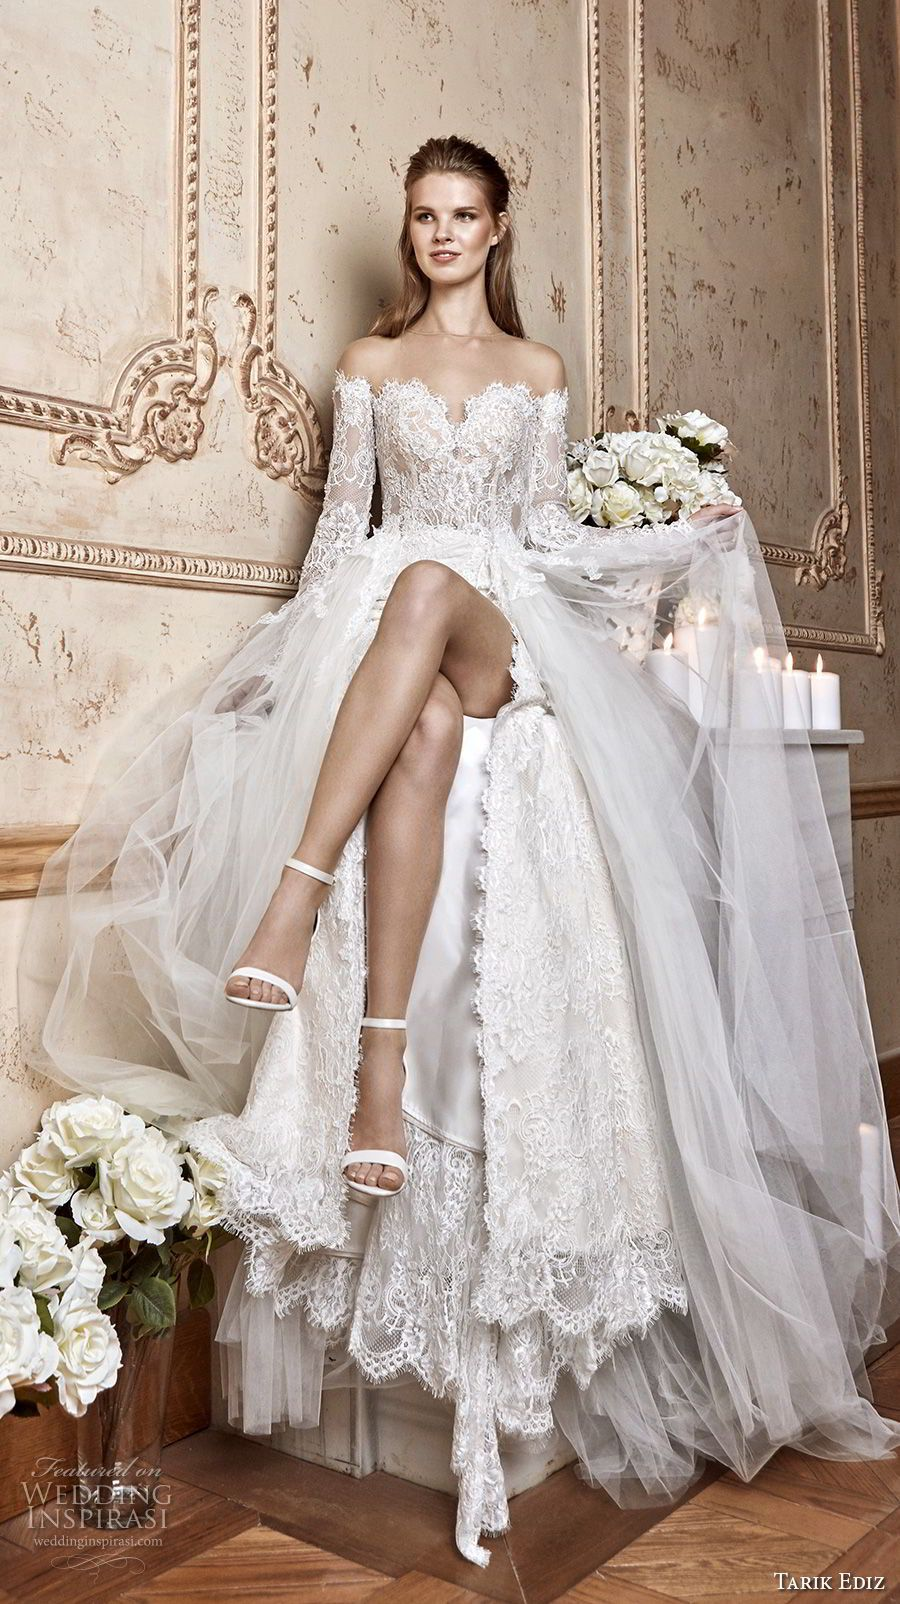 Tarik Ediz White 2017 Wedding Dresses Wedding Inspirasi Wedding Dresses Elegant Wedding Dress Bridal